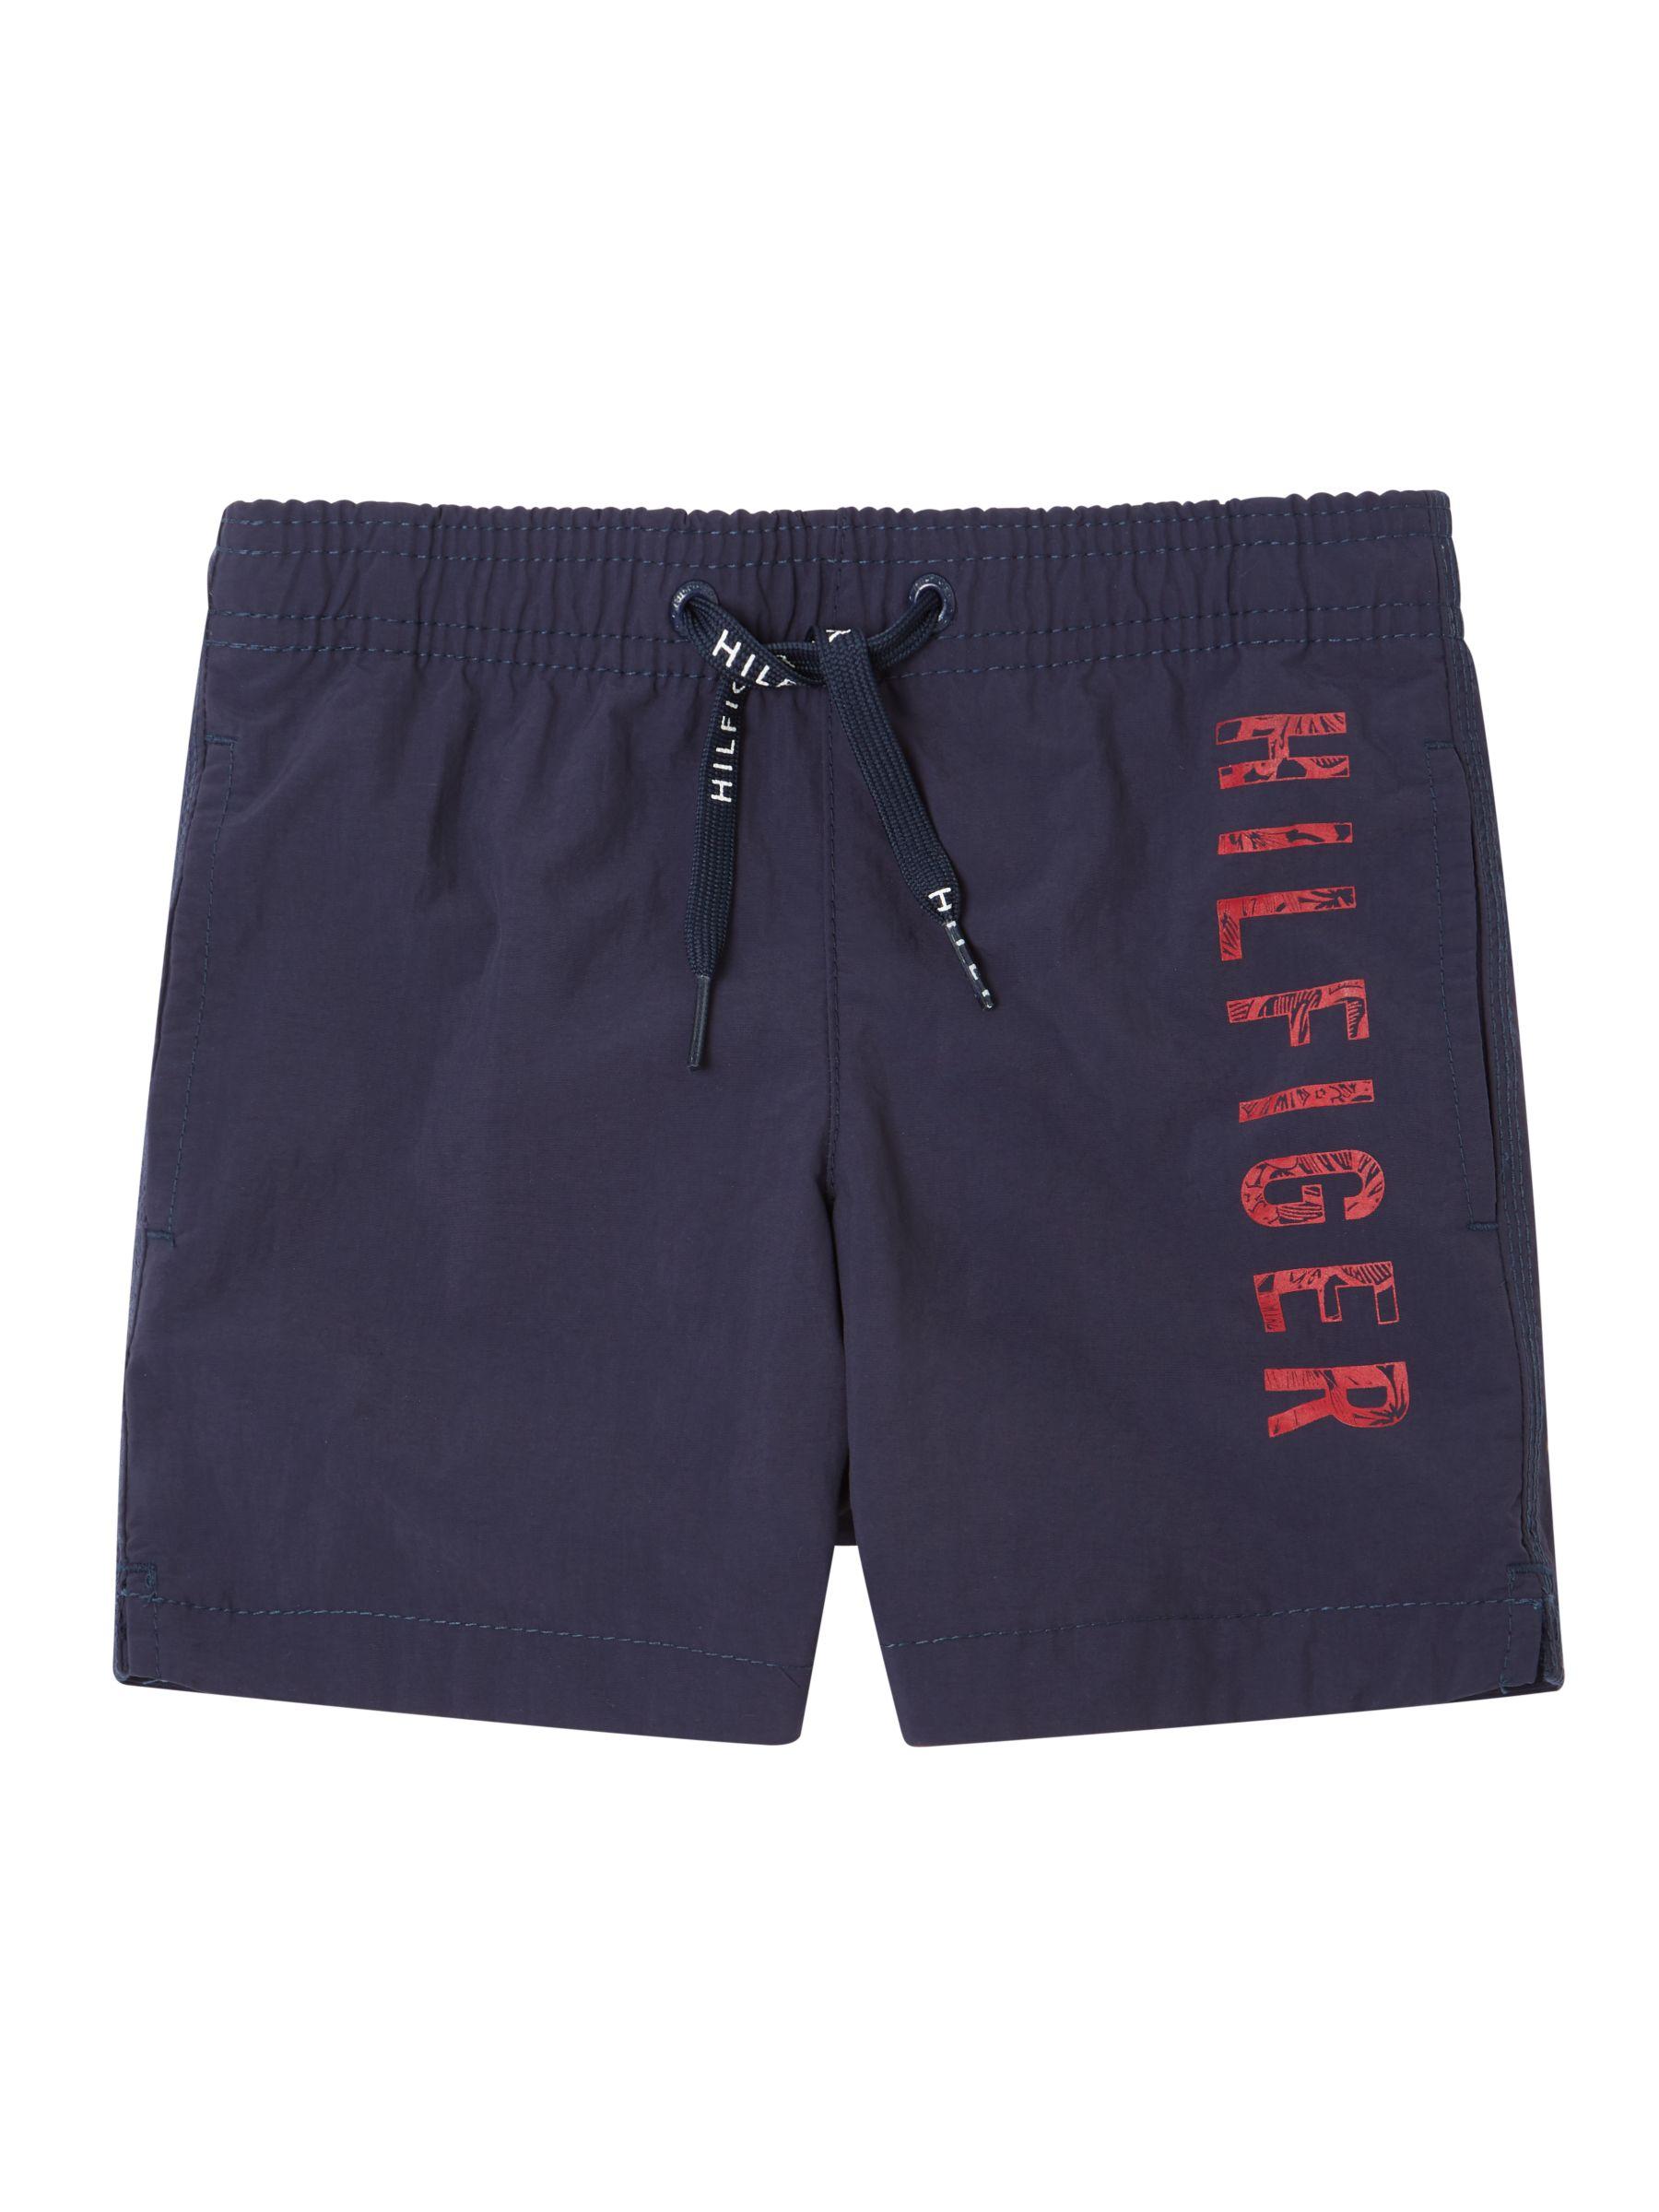 506c5c803 Tommy Hilfiger Boys  Swim Shorts